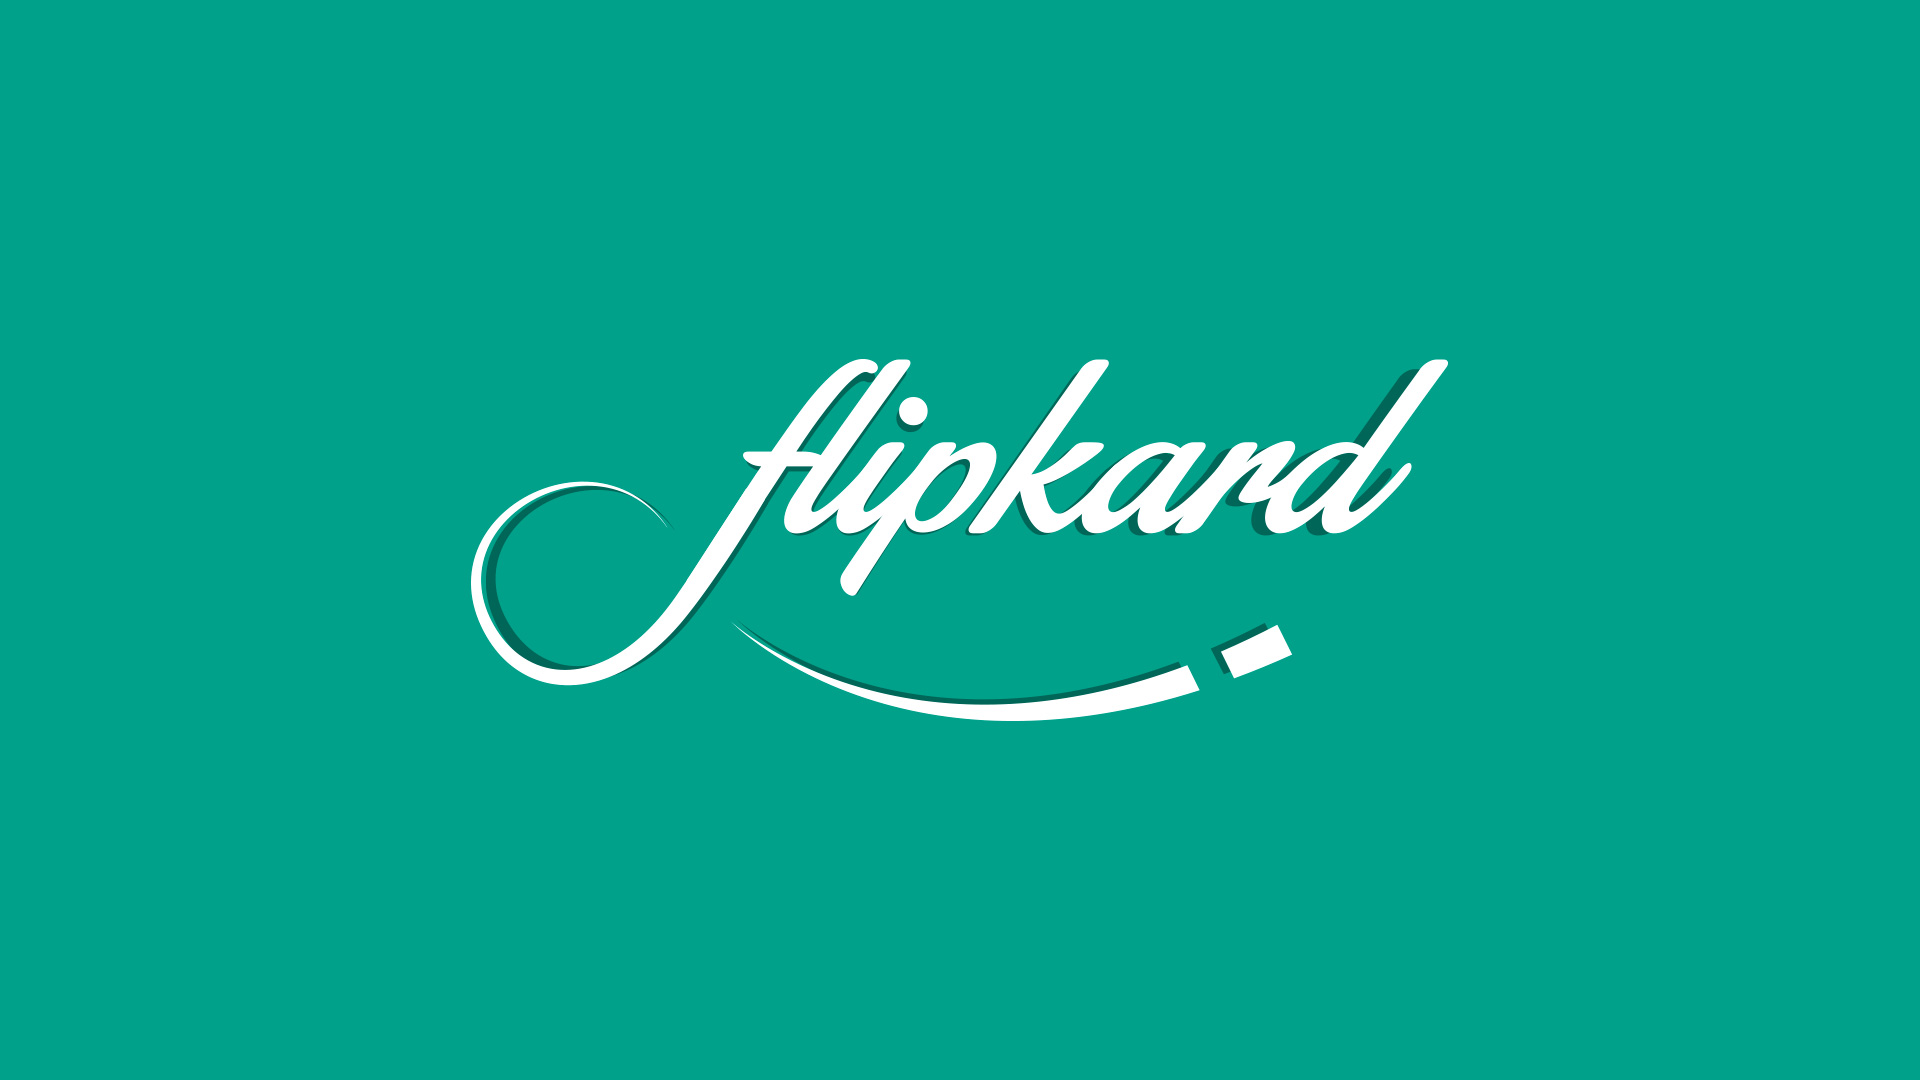 01_florian_branchet_designer_graphique_flipkard_intro